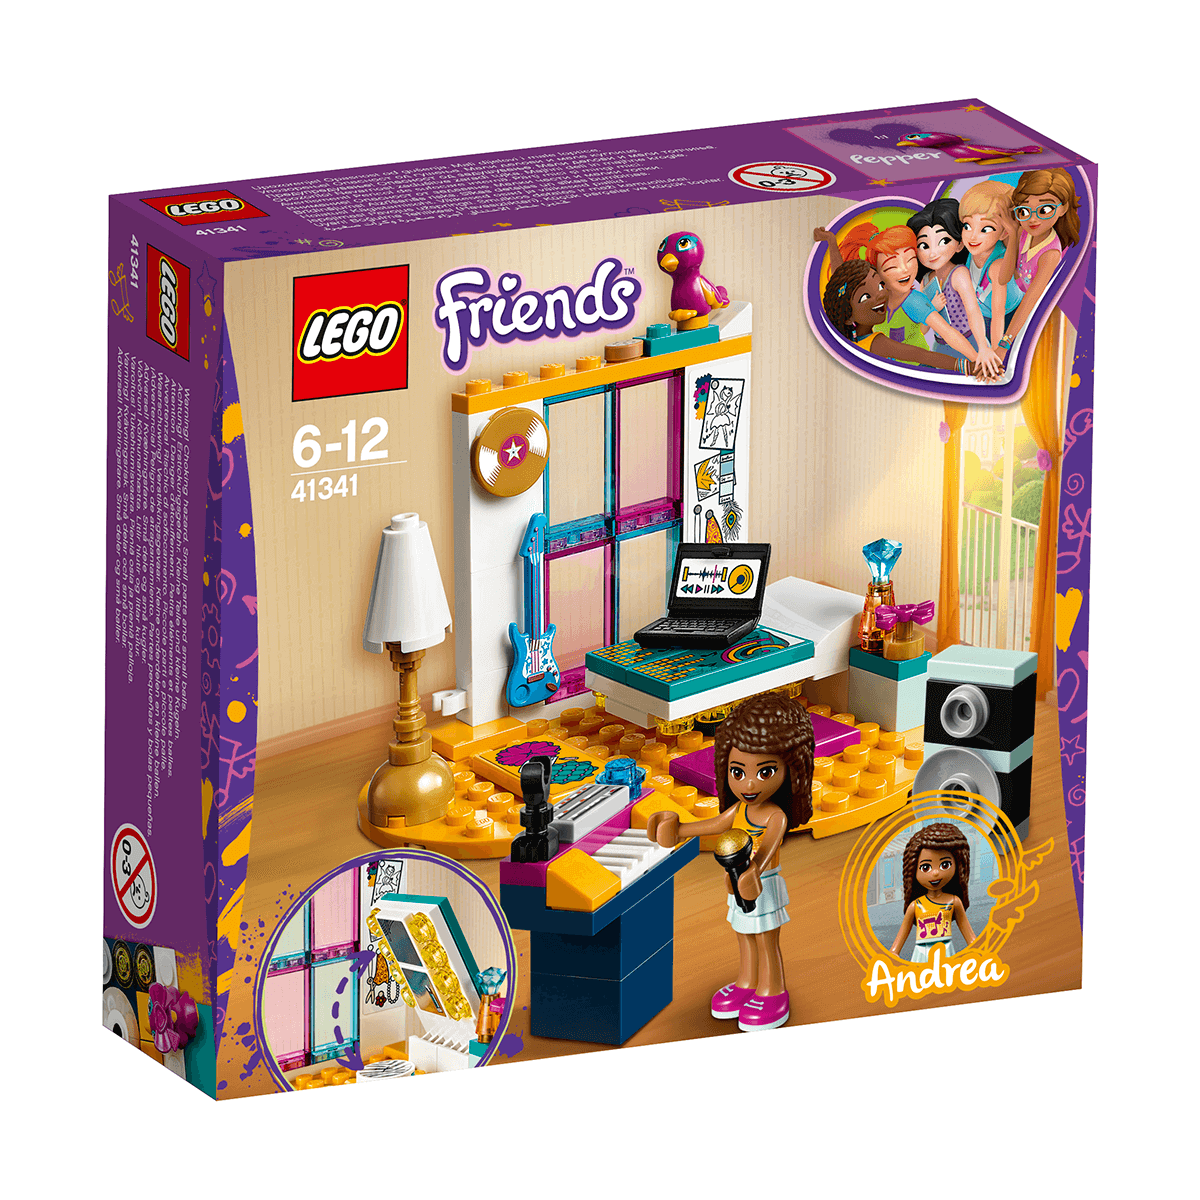 LEGO Friends Andrea's Bedroom - 41341